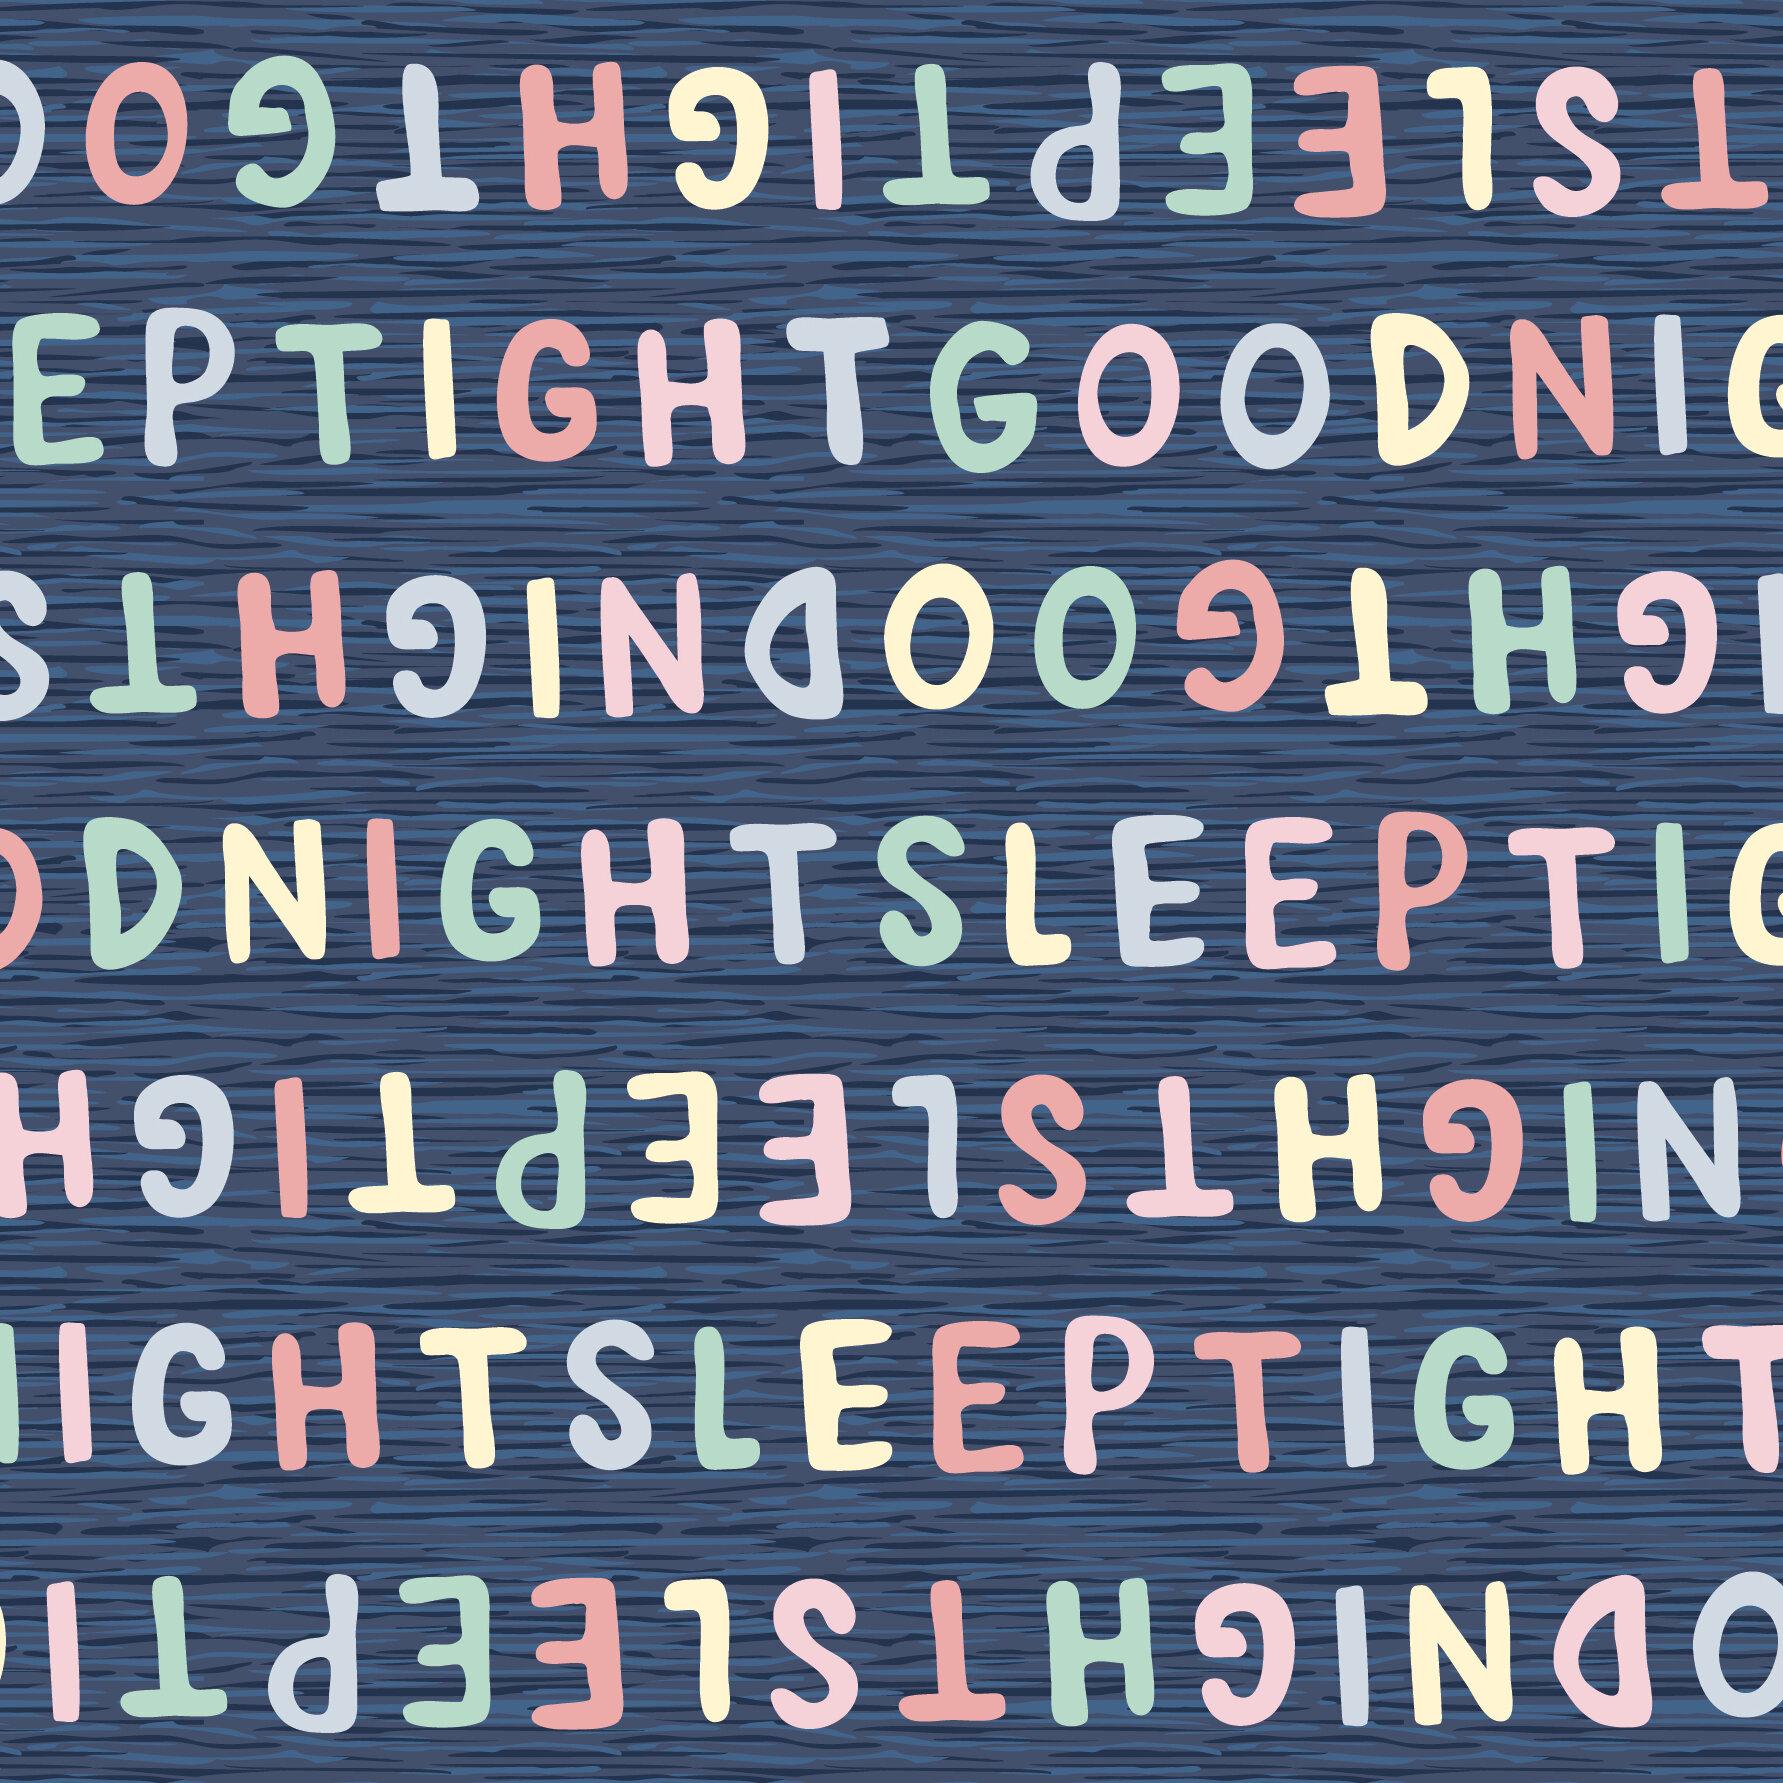 Sleep Tight-S414-01.jpg